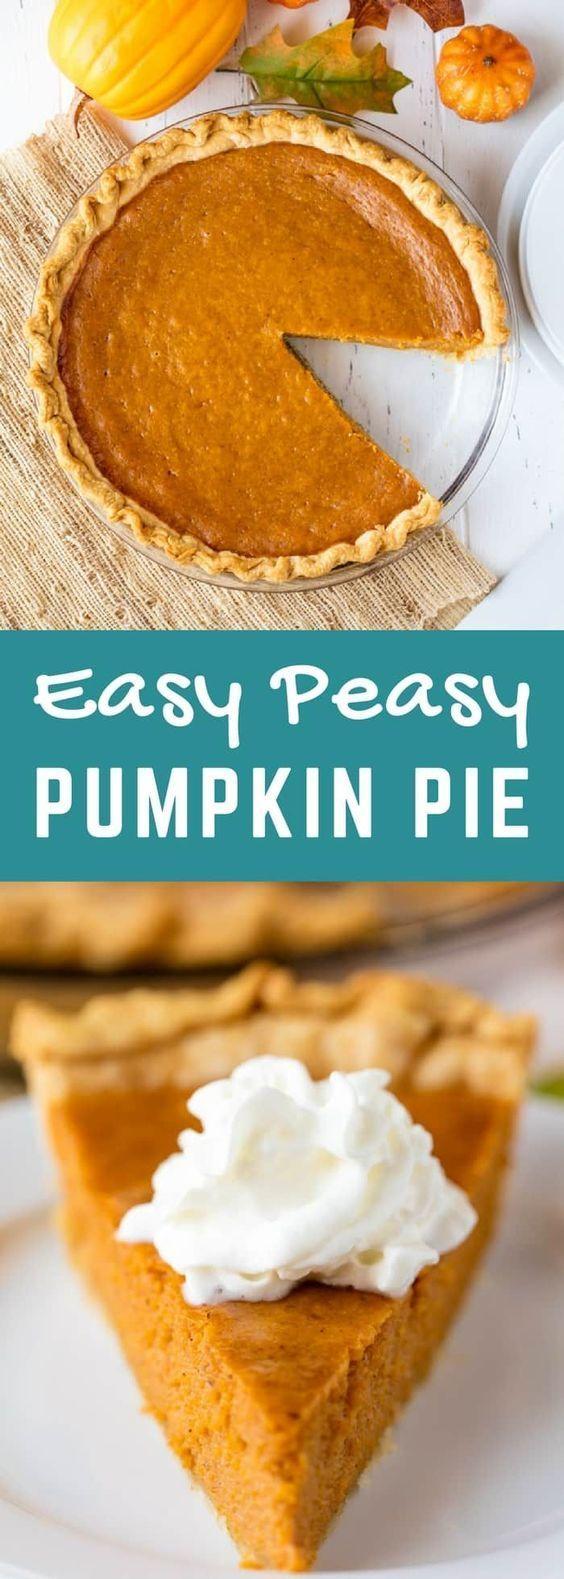 Easy Peasy Pumpkin Pie